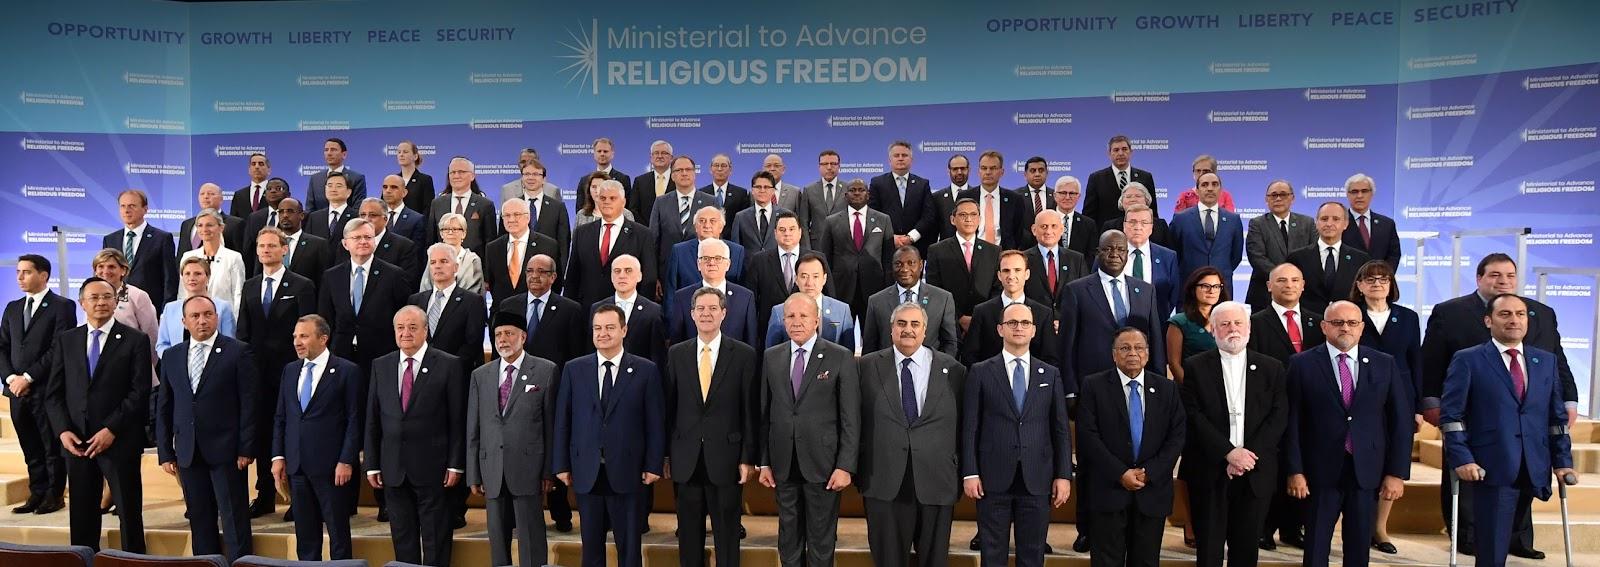 Ngoại trưởng Hoa Kỳ Mike Pompeo khai mạc hội nghị Ministerial to Advance Religious Freedom